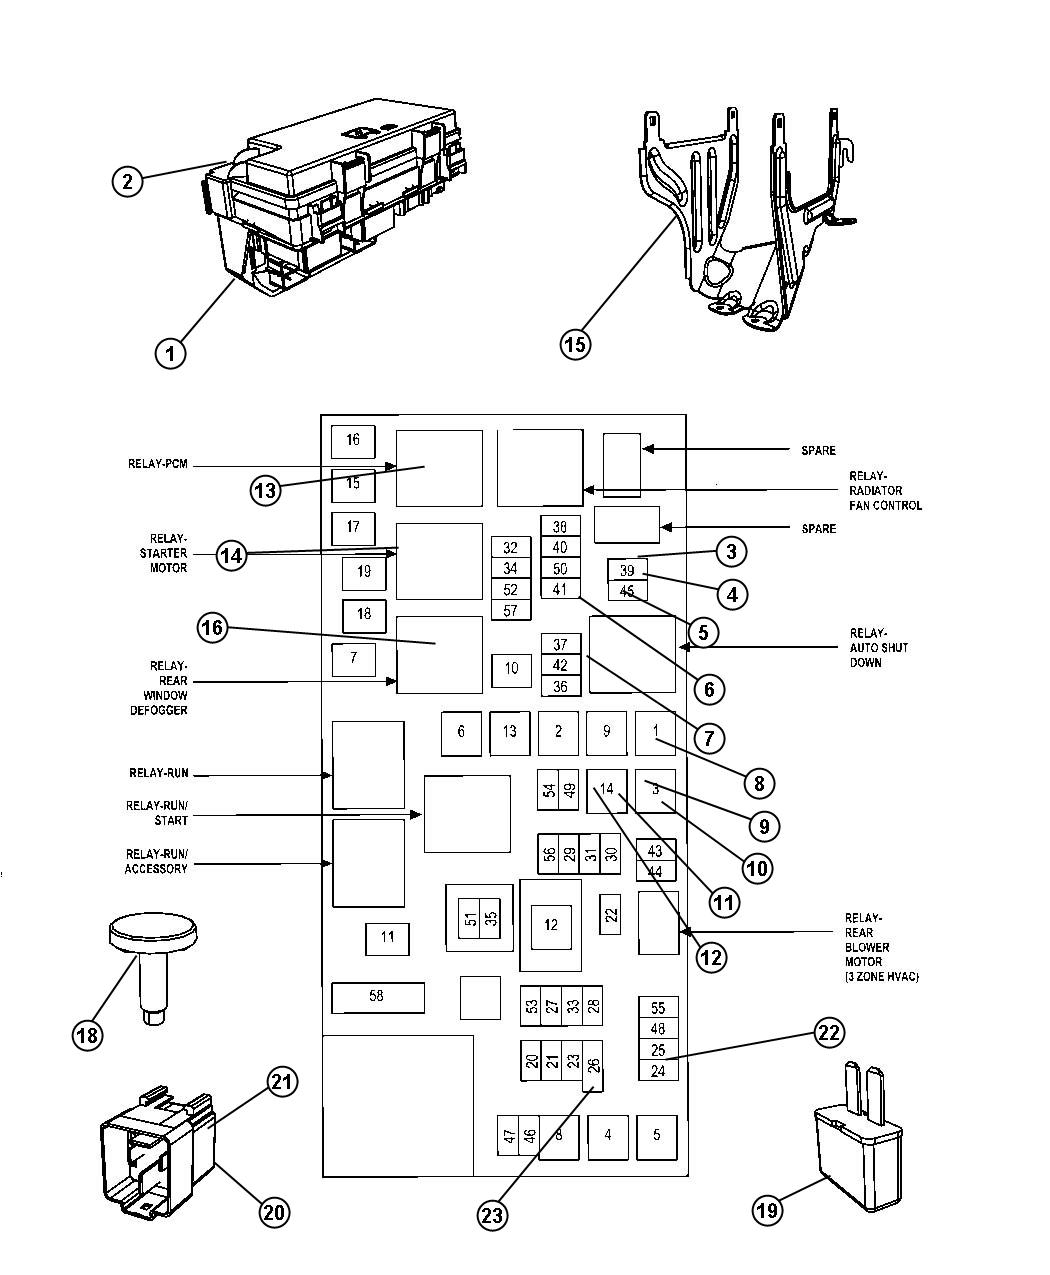 Dodge Nitro 3 7 Relay Diagram